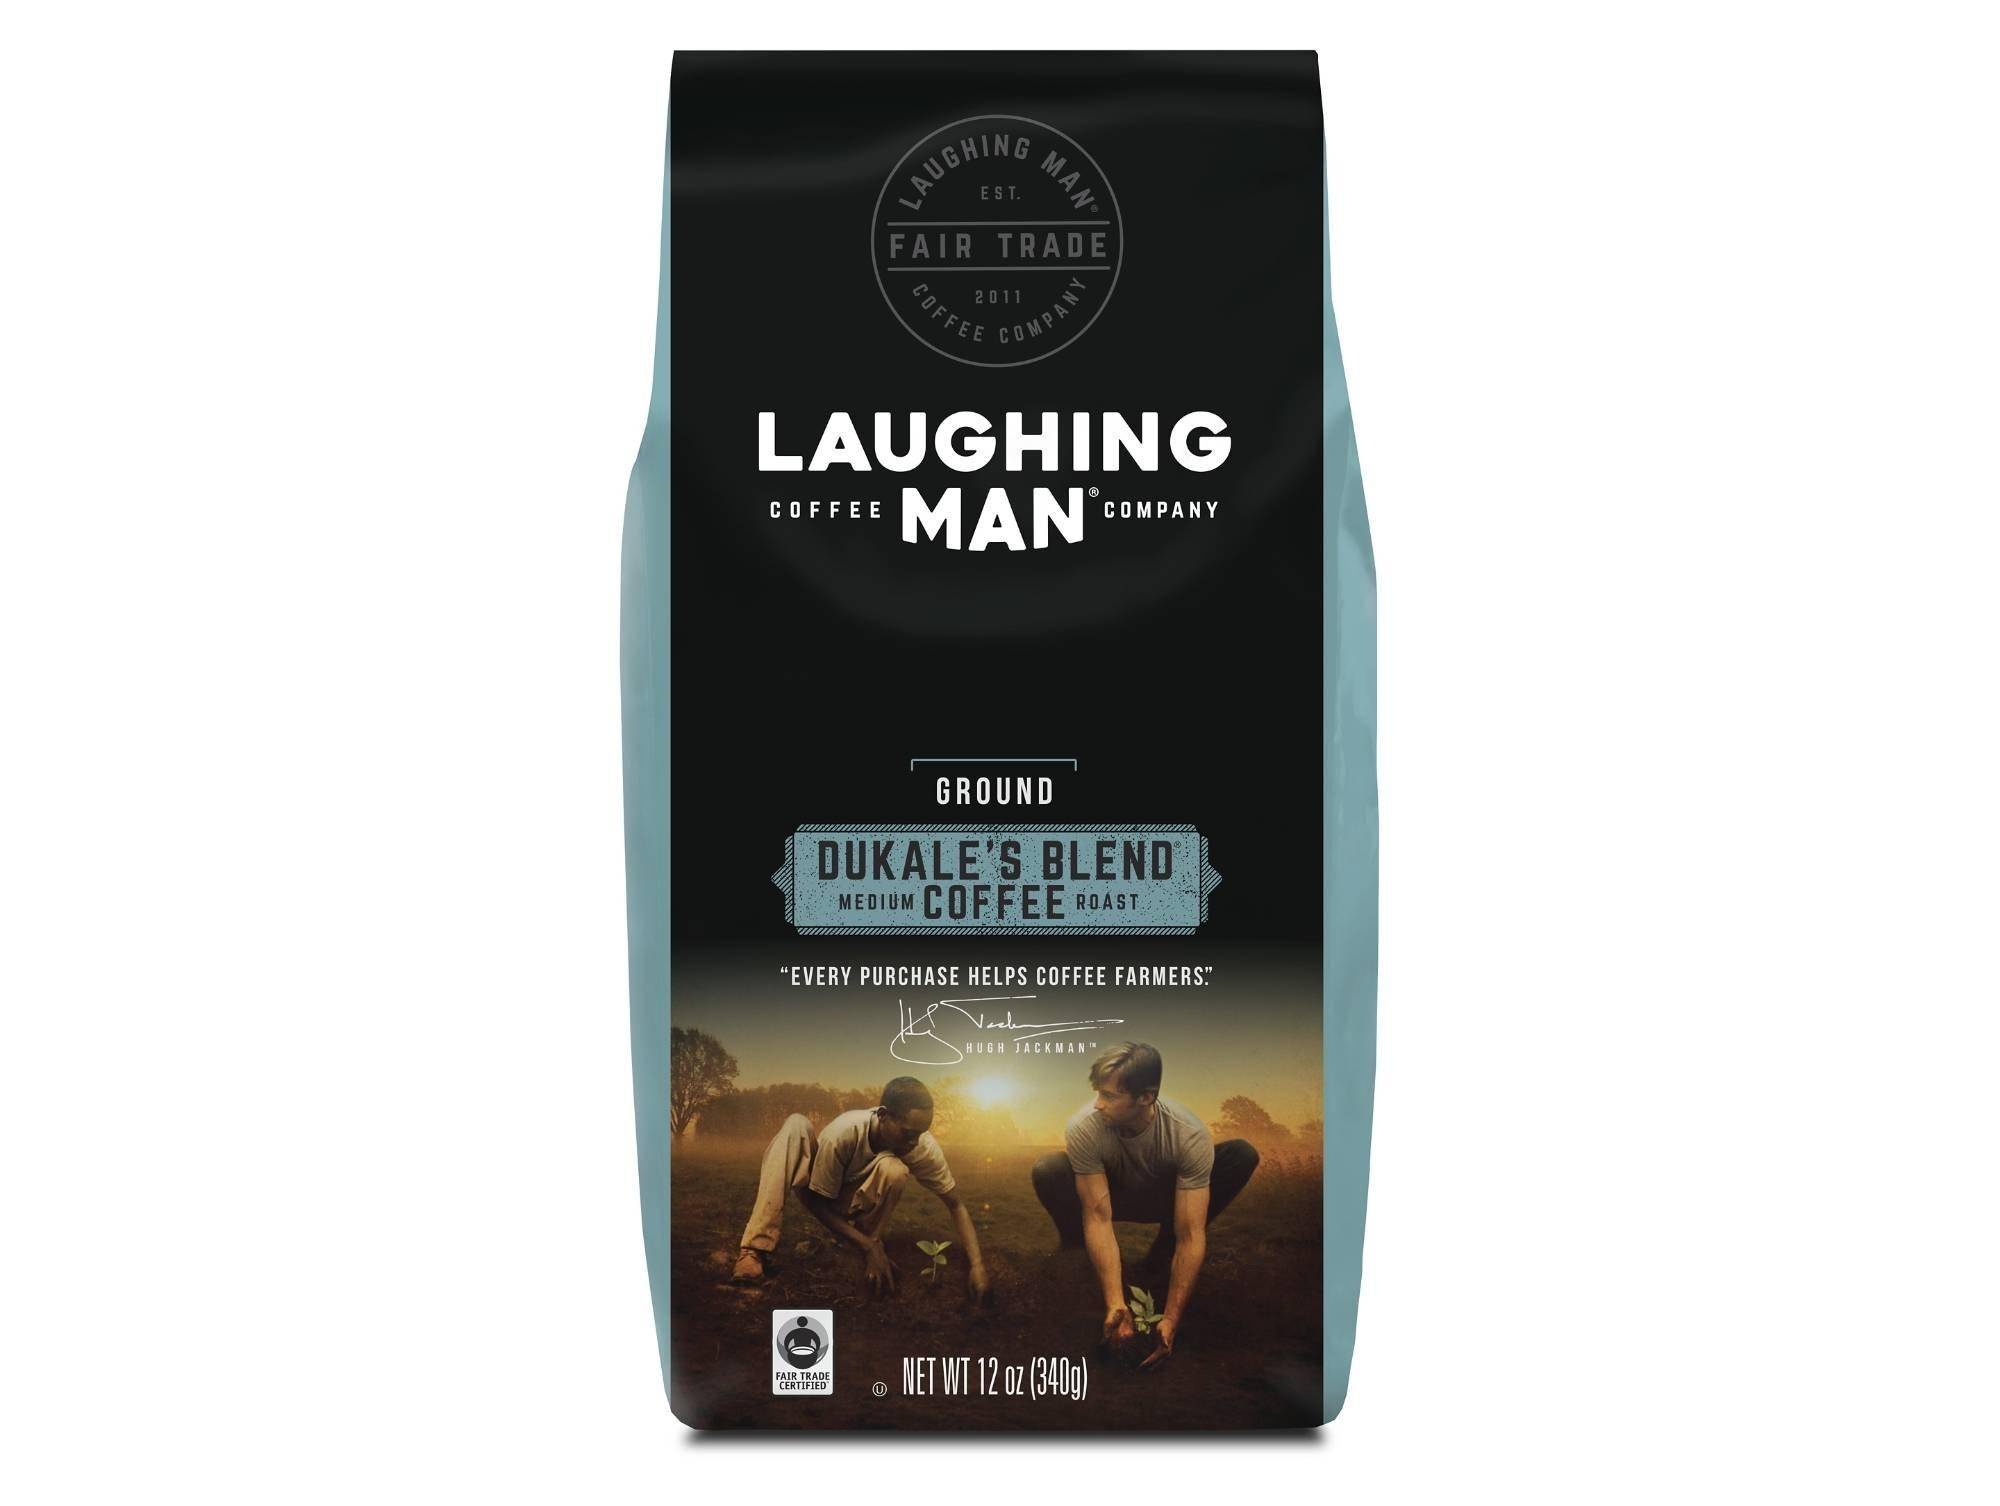 Laughing Man Dukale's Blend, Ground Coffee, Medium Roast, Bagged 12 oz